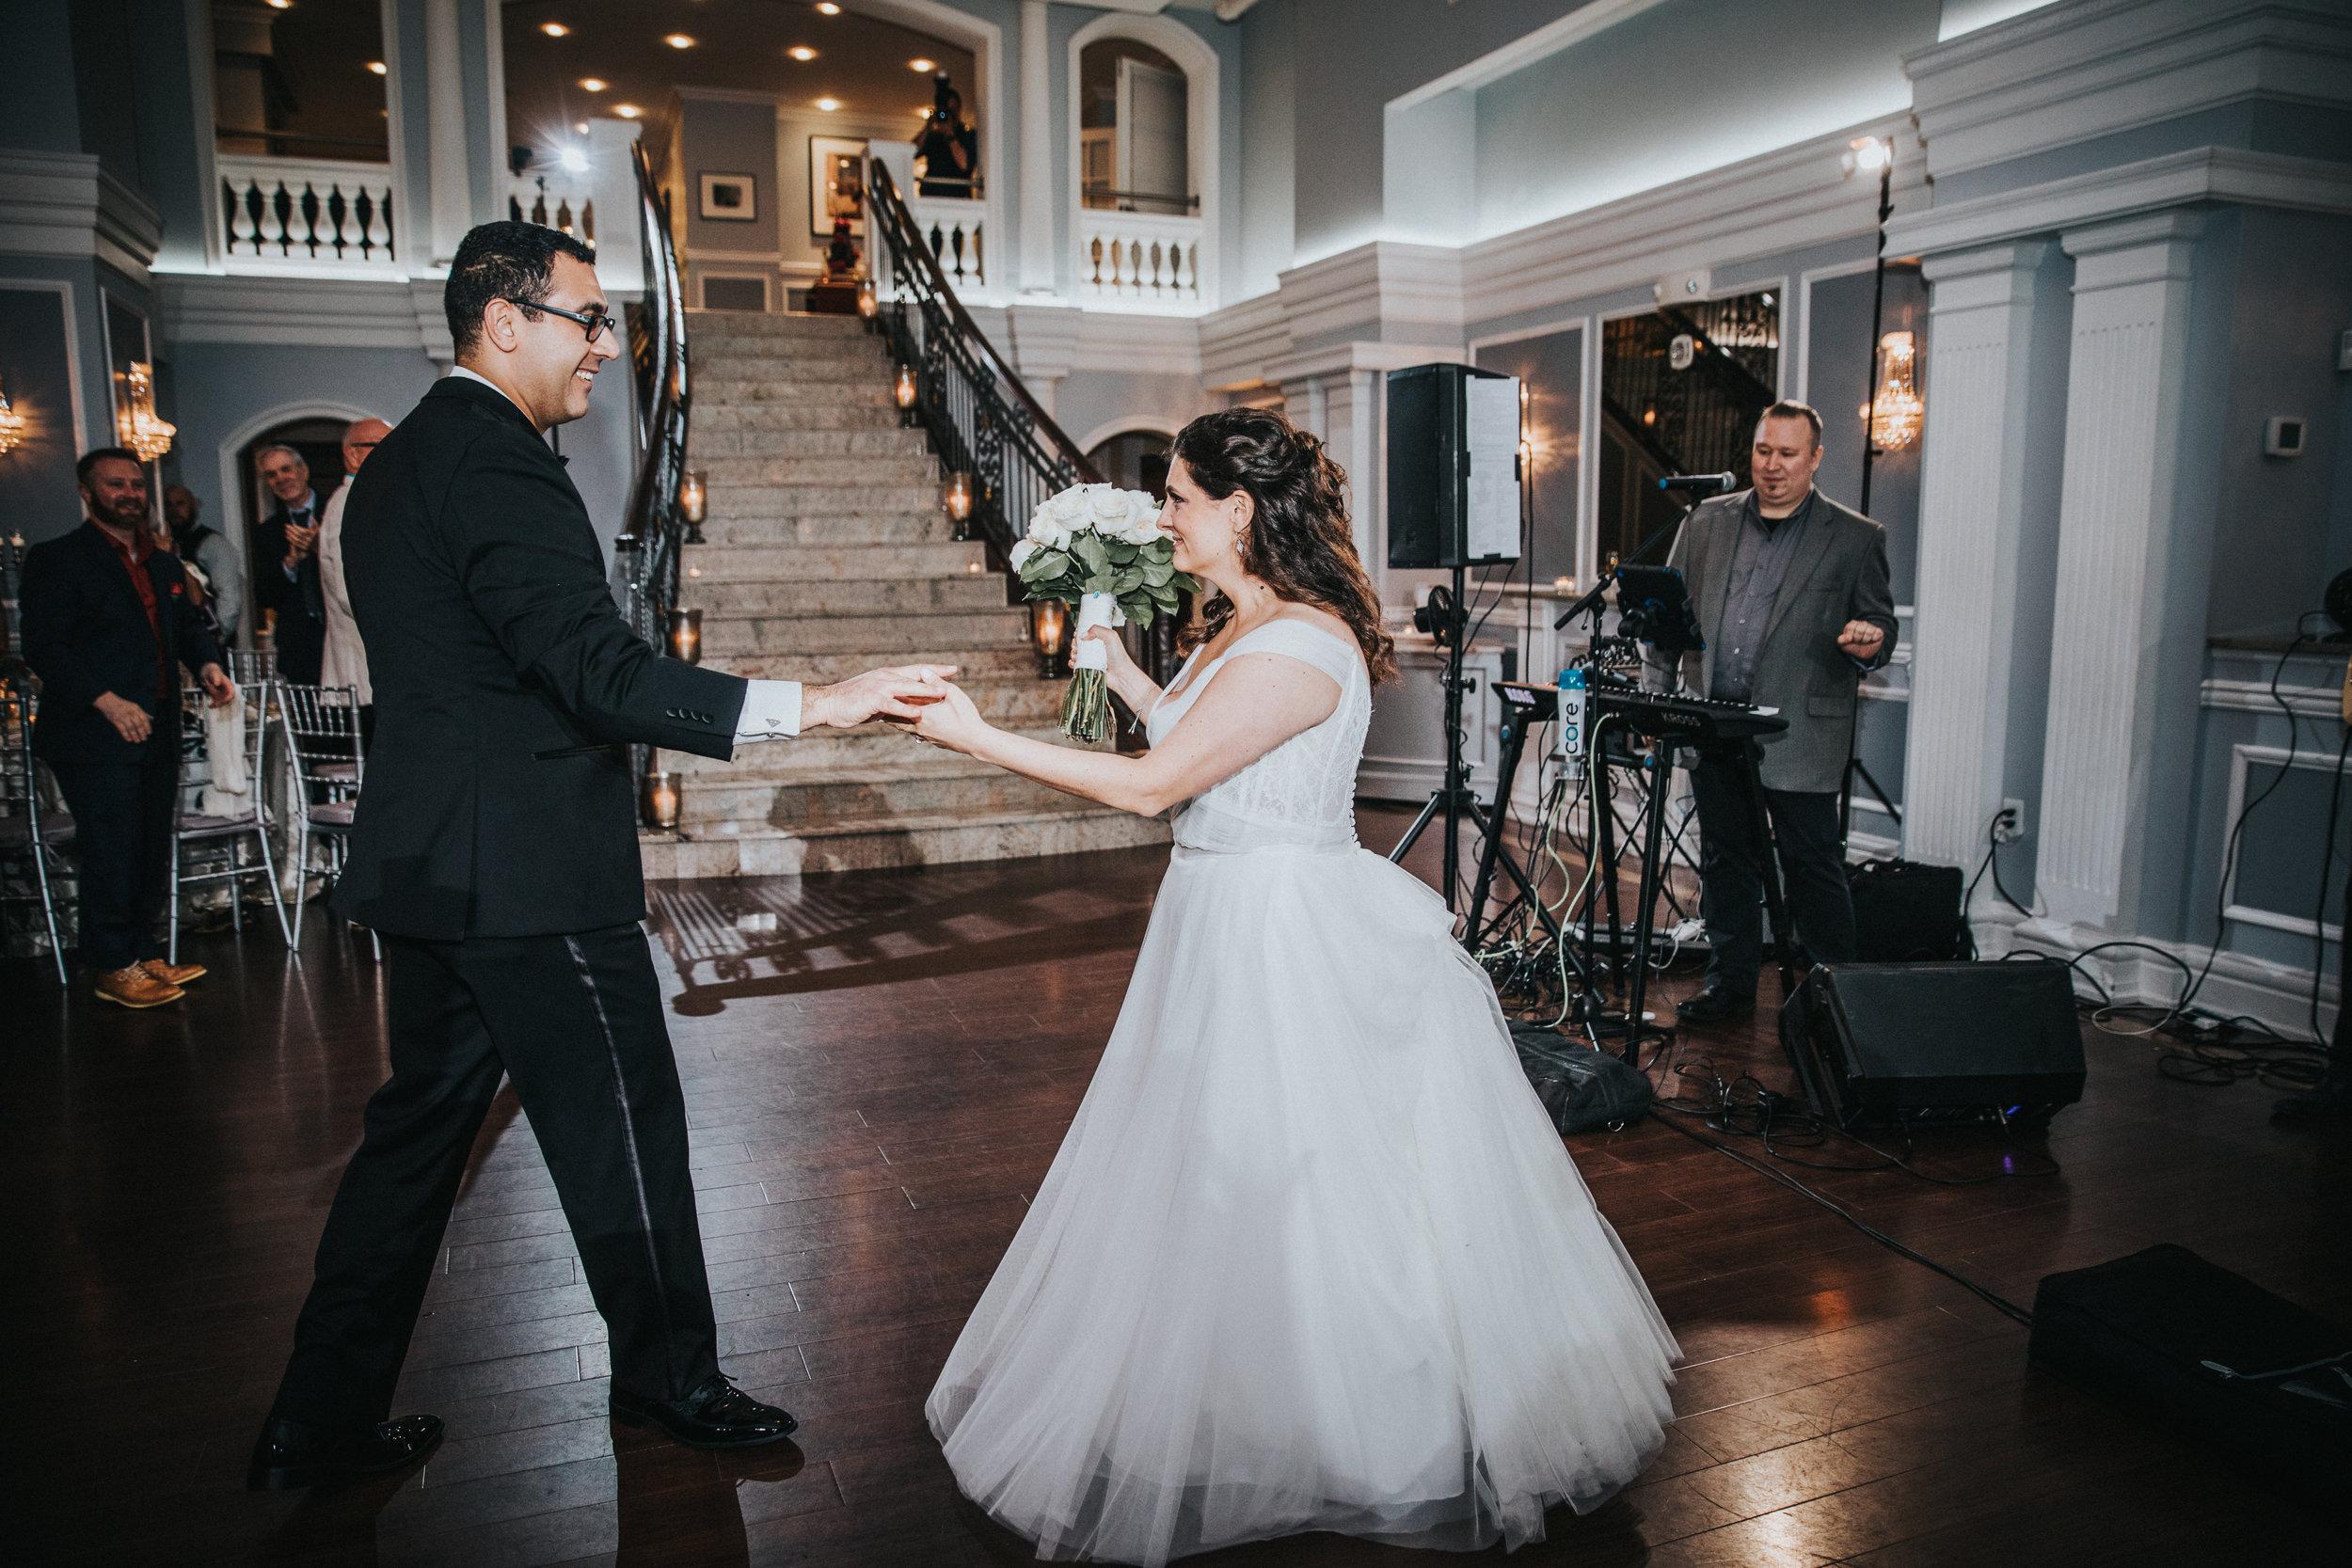 JennaLynnPhotography-NJWeddingPhotographer-Philadelphia-Wedding-ArtsBallroom-Reception-17.jpg